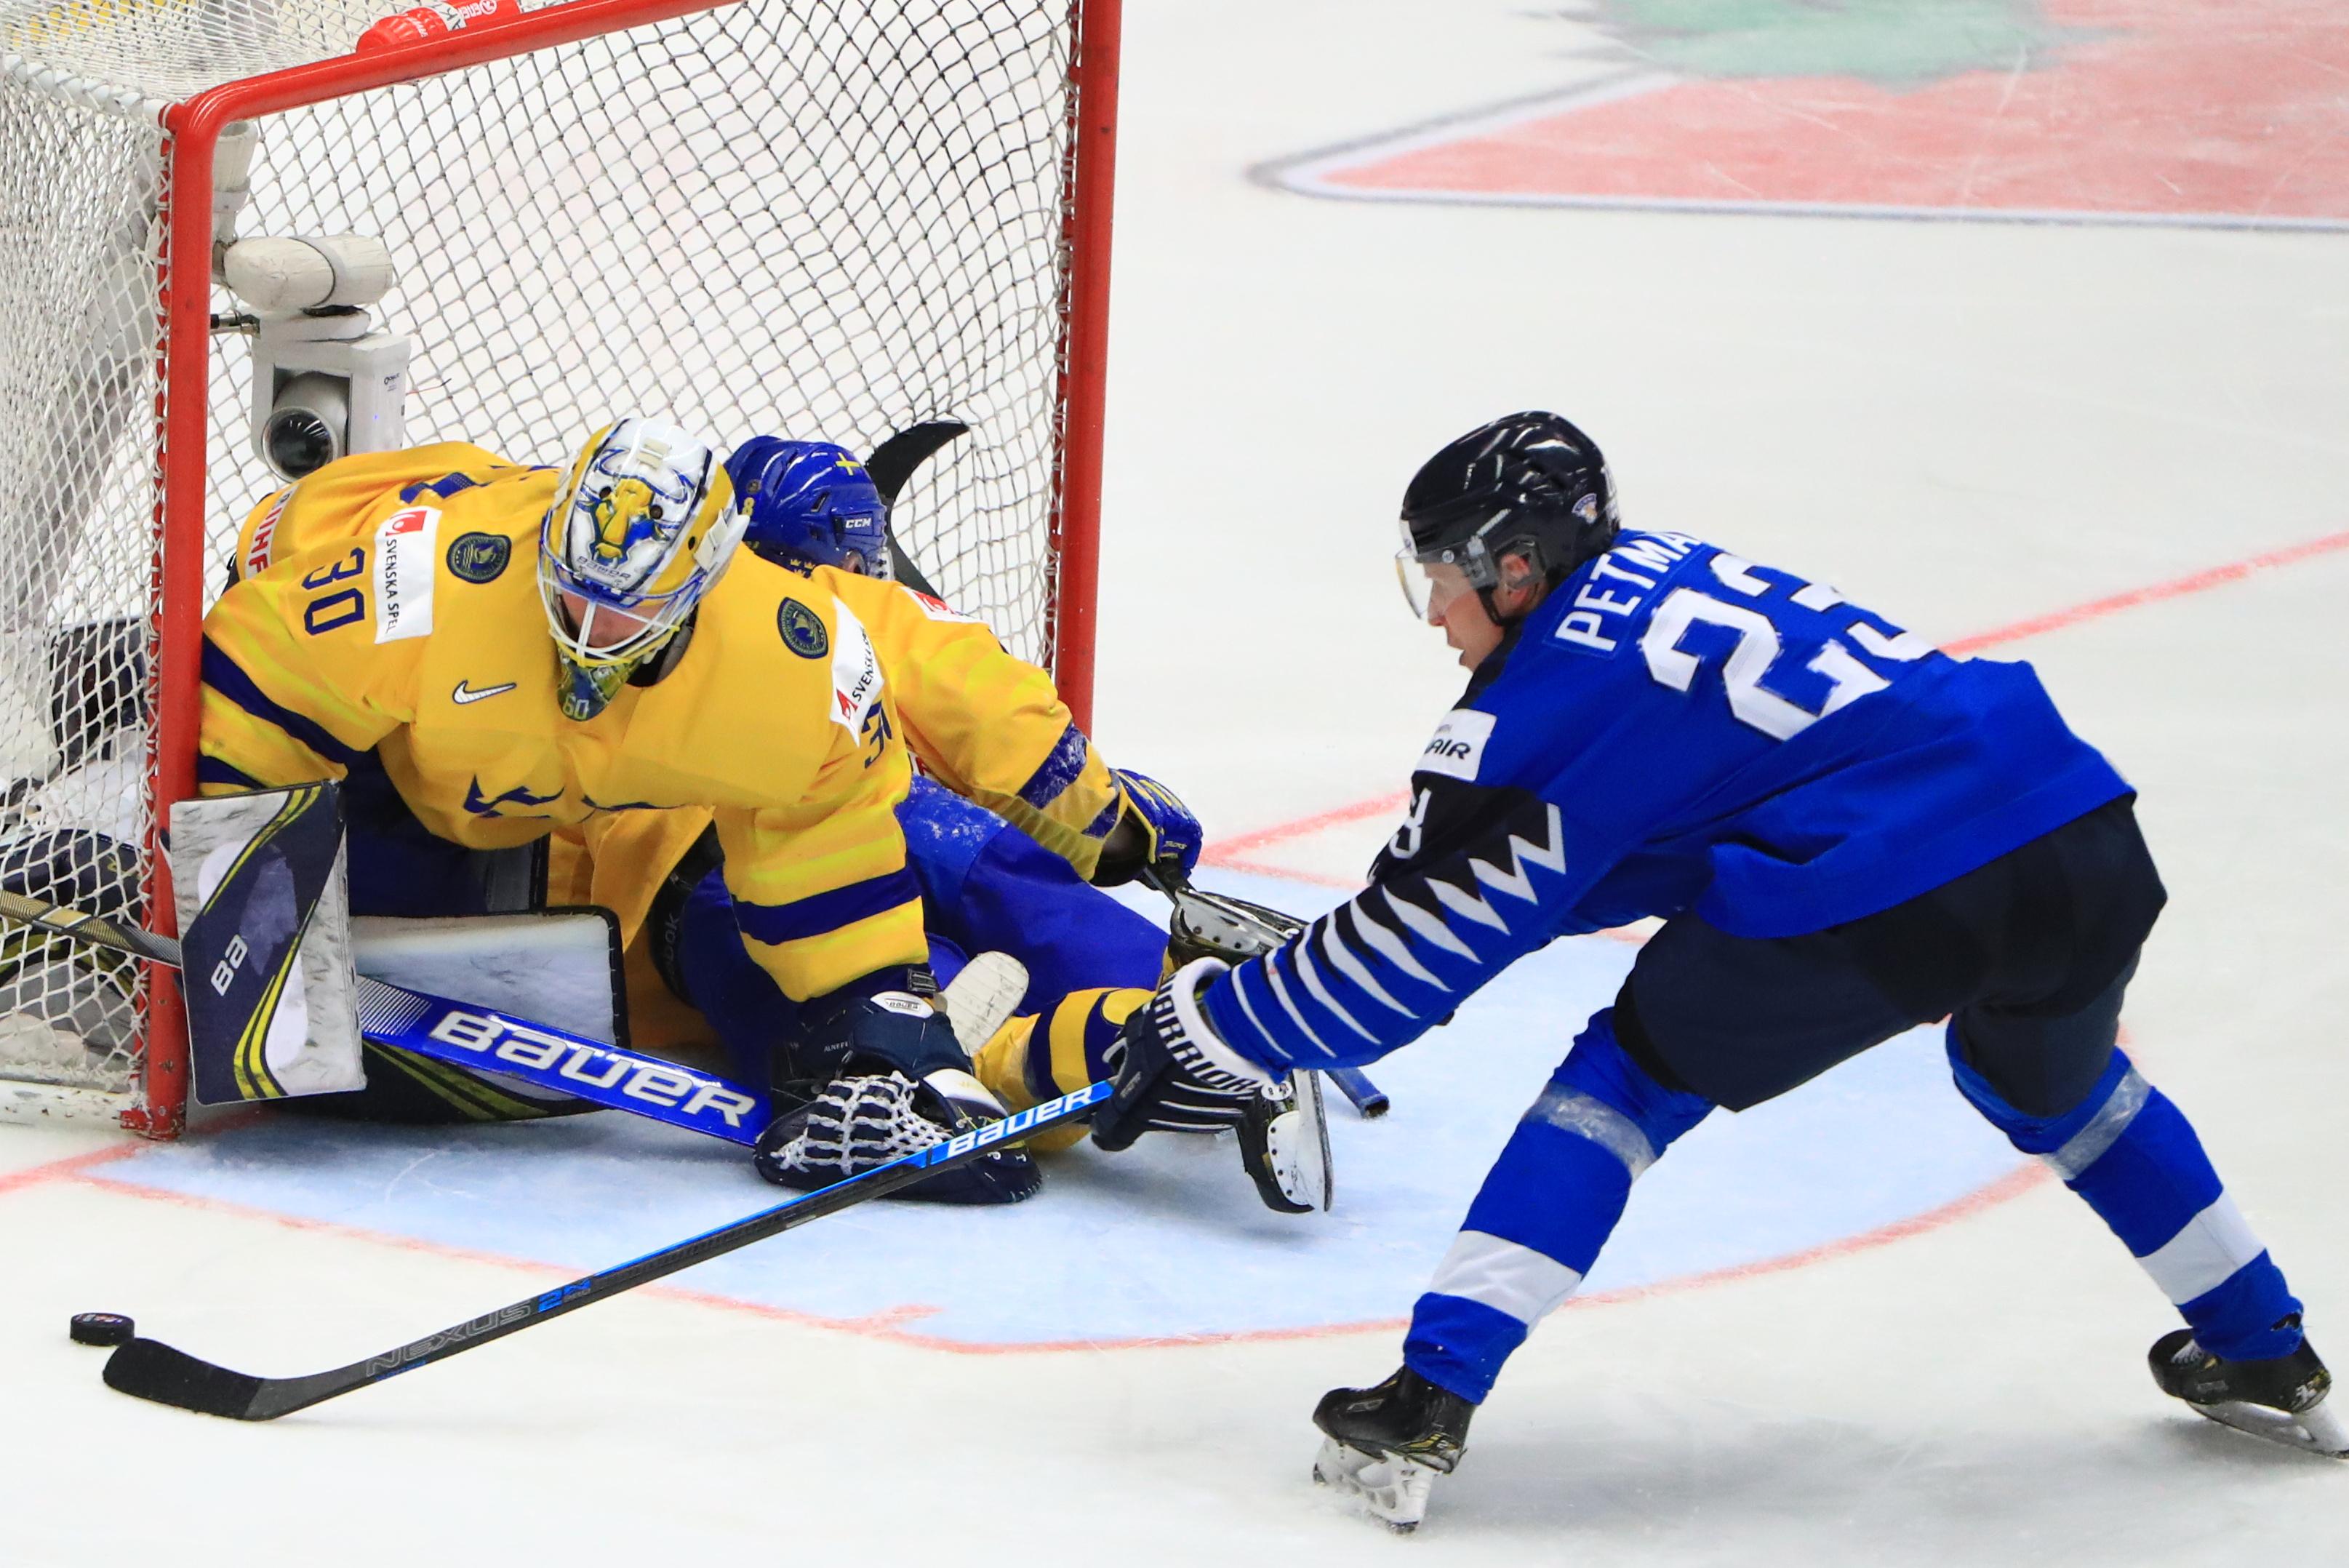 2020 World Junior Ice Hockey Championship, bronze medal match: Sweden 3 - 2 Finland